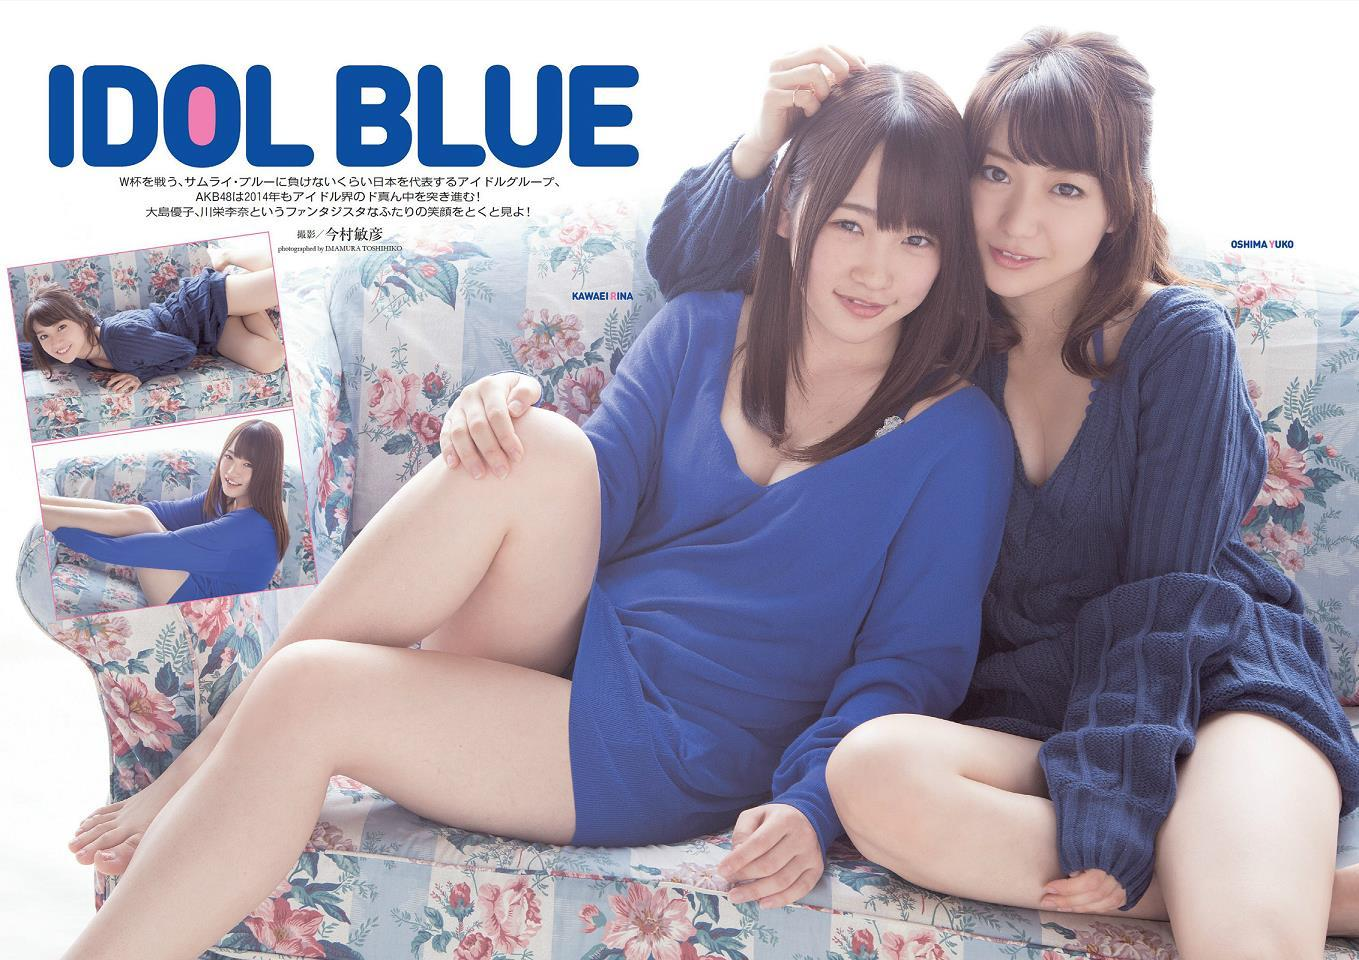 kawaei_rina019.jpg